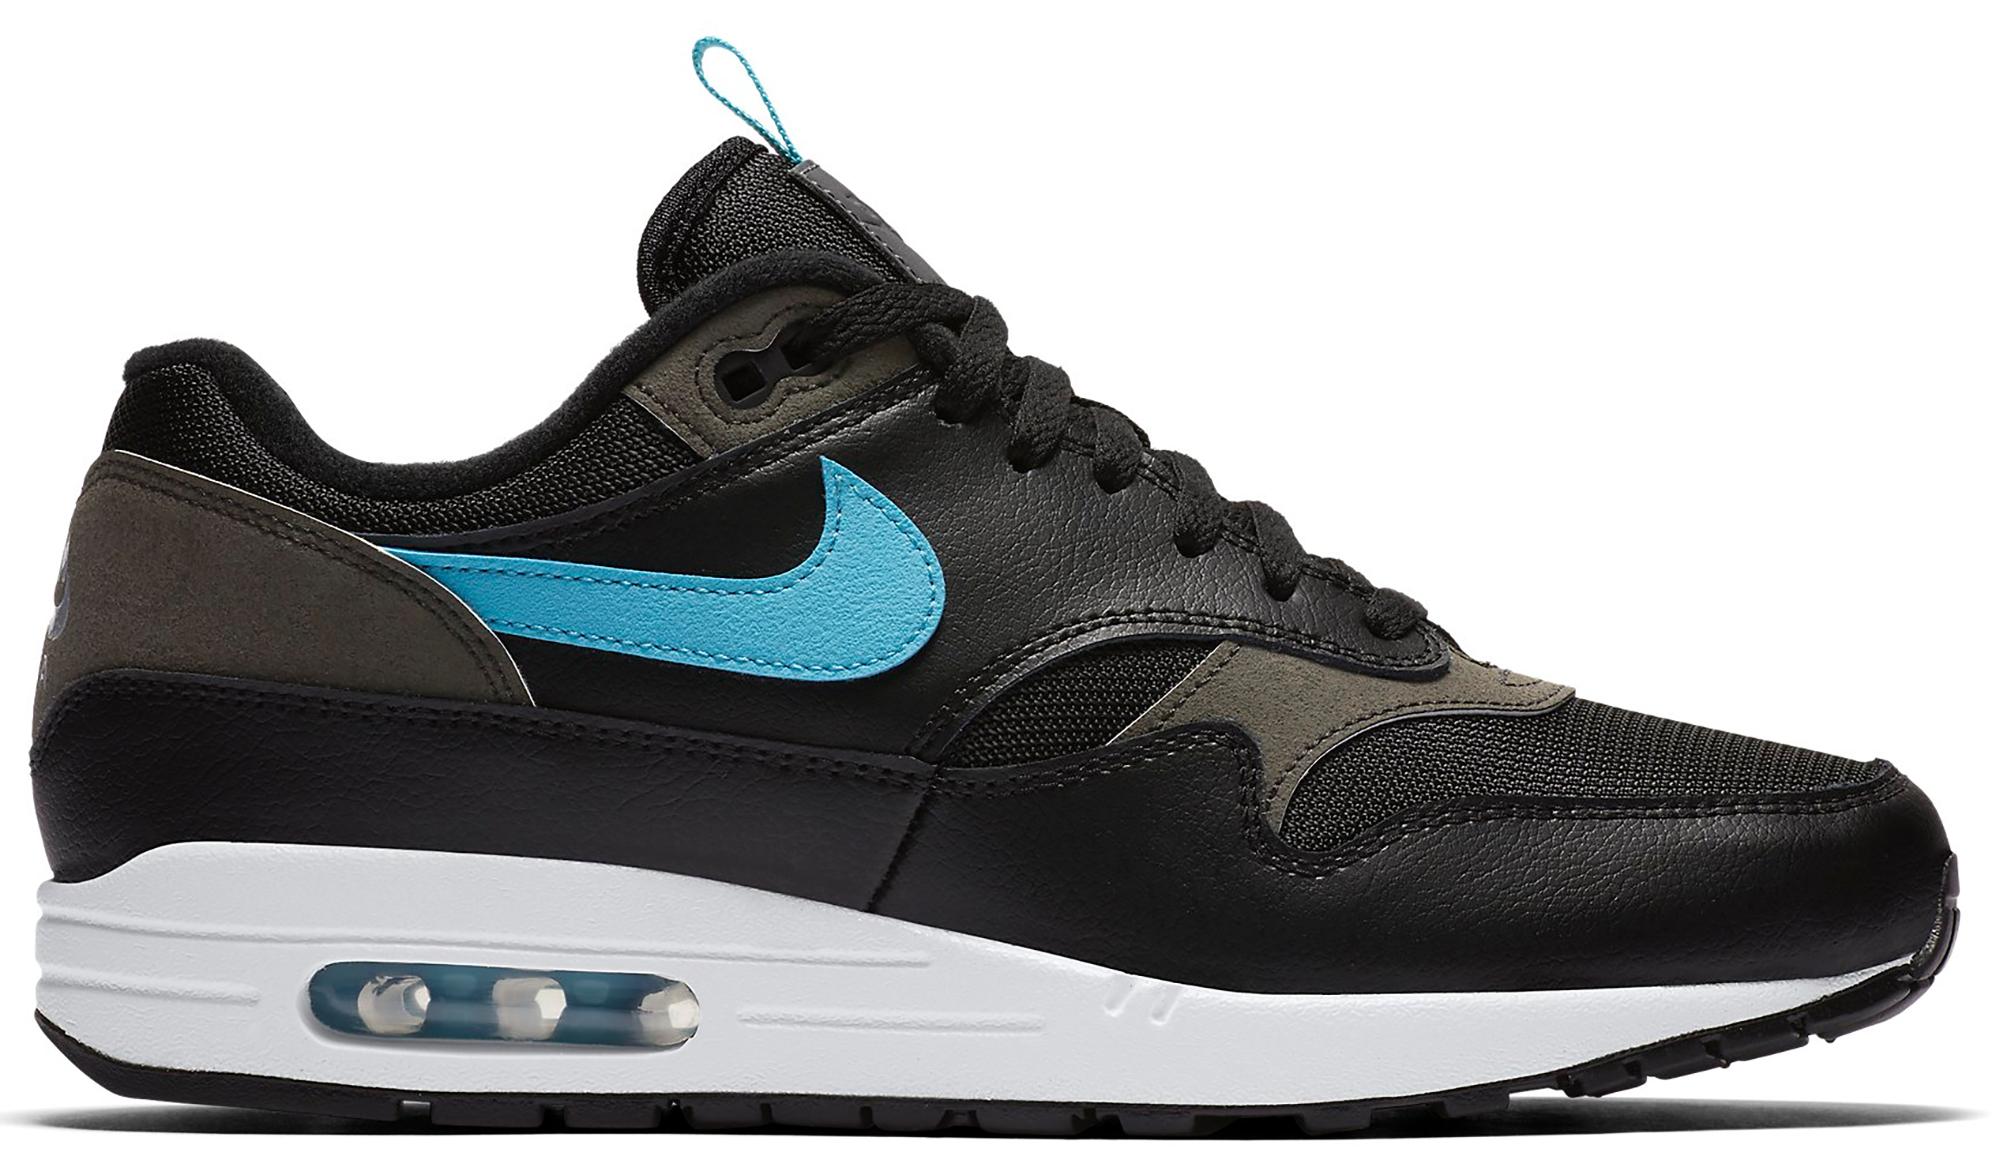 Nike Air Max 1 Tongue Tab Black Blue